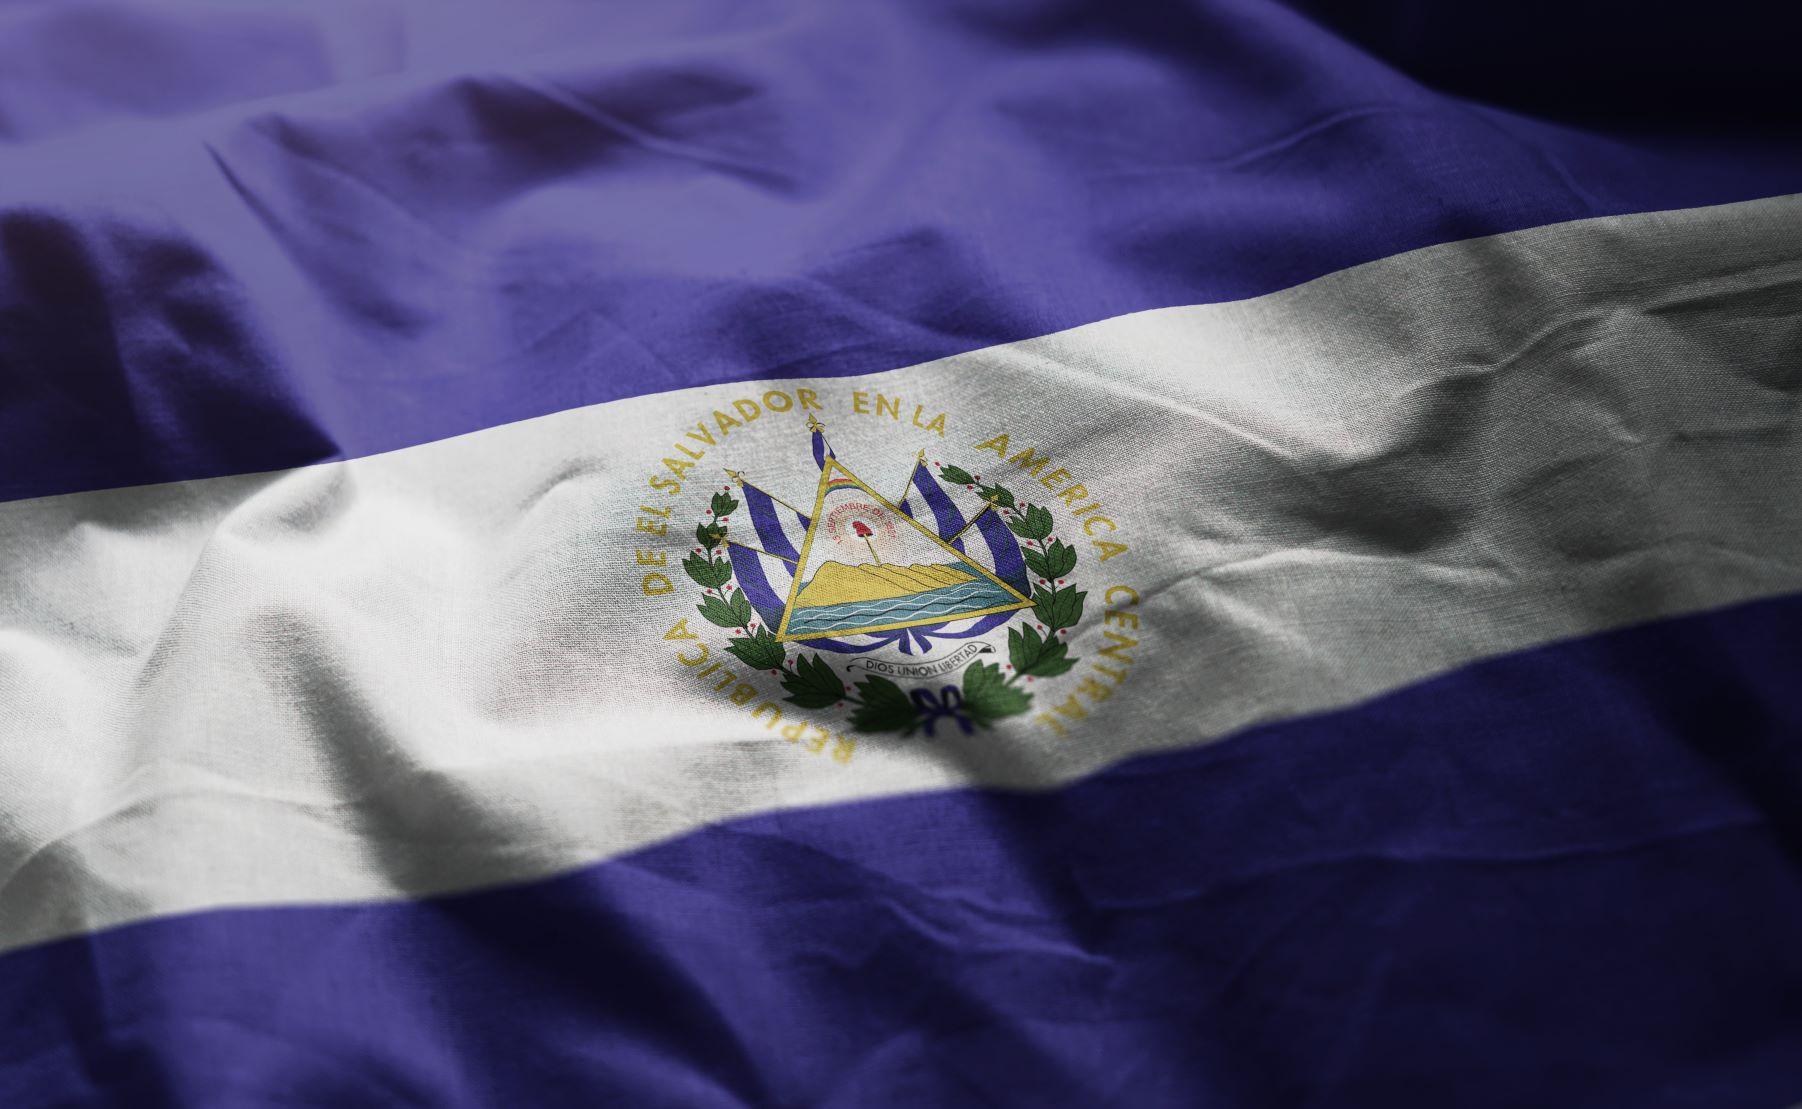 El Salvador: Damage limitation exercise brings respite but downside risks remain